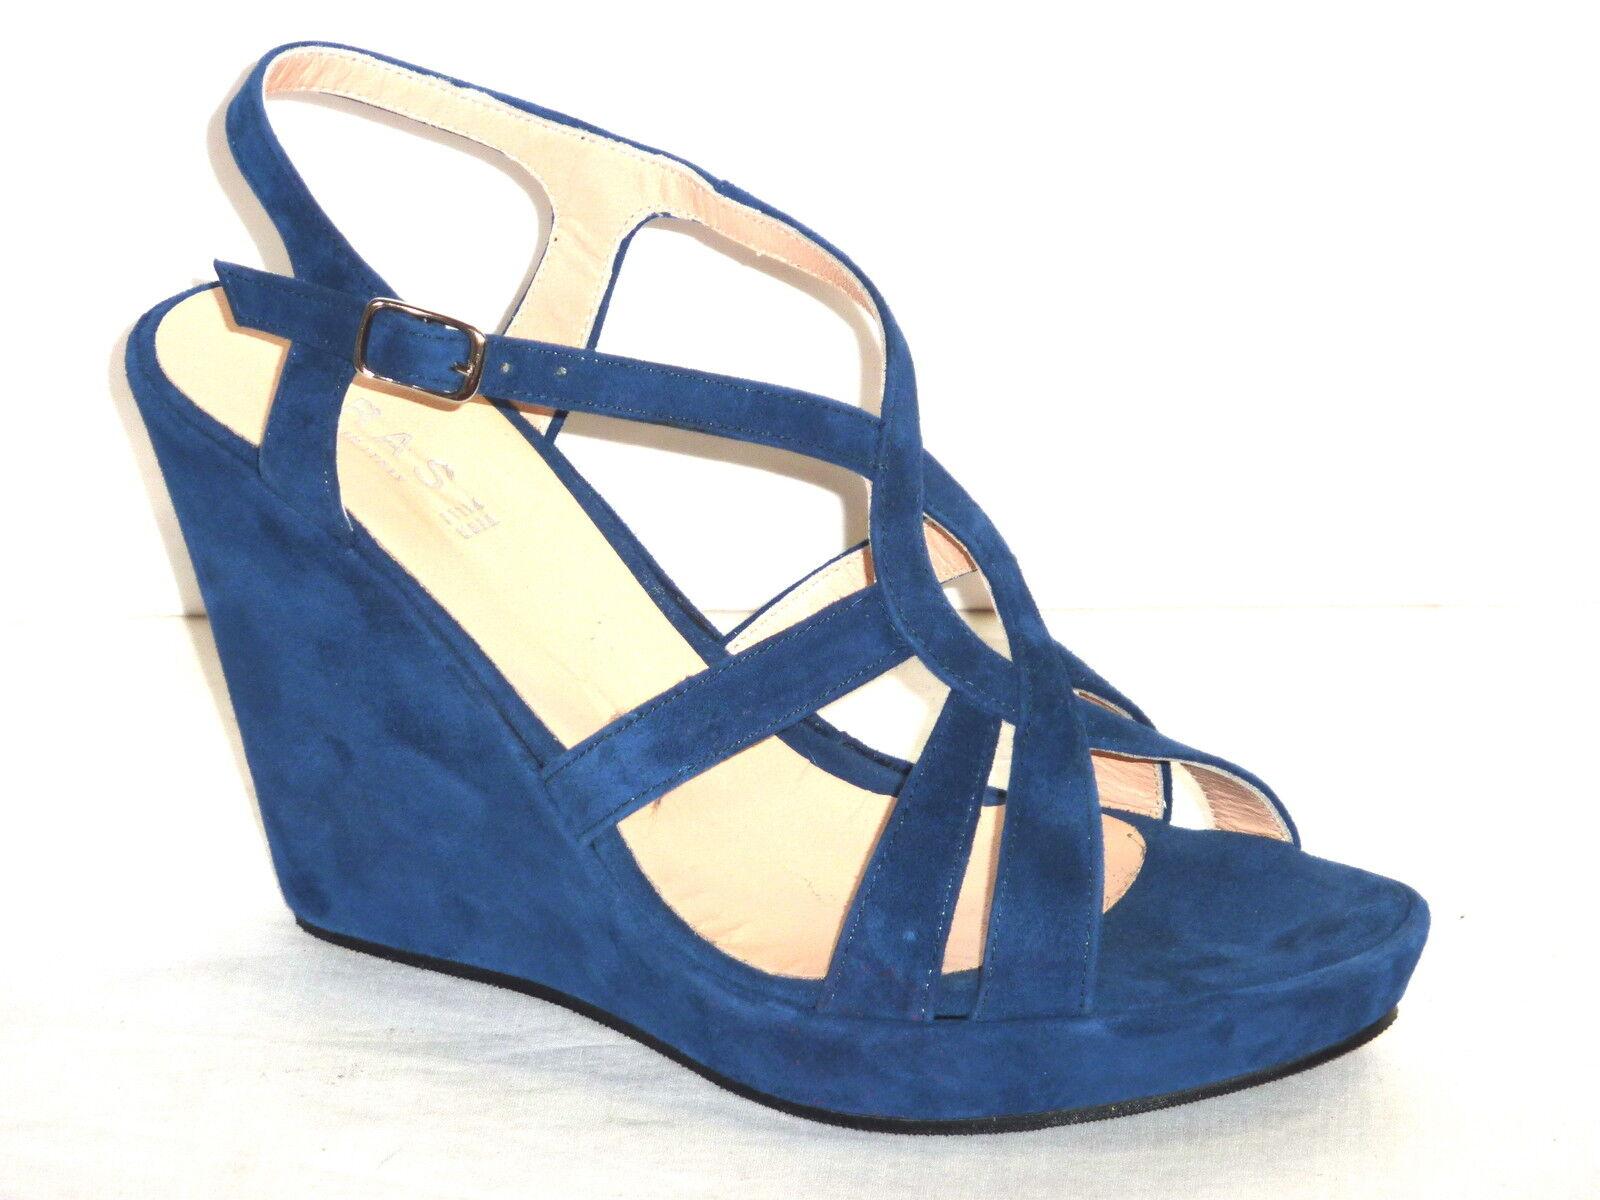 837 ZEPPE SANDALI mujer FONDO FONDO FONDO RIVESTITO PELLE NABUK azul Made in  n. 36  tienda de bajo costo